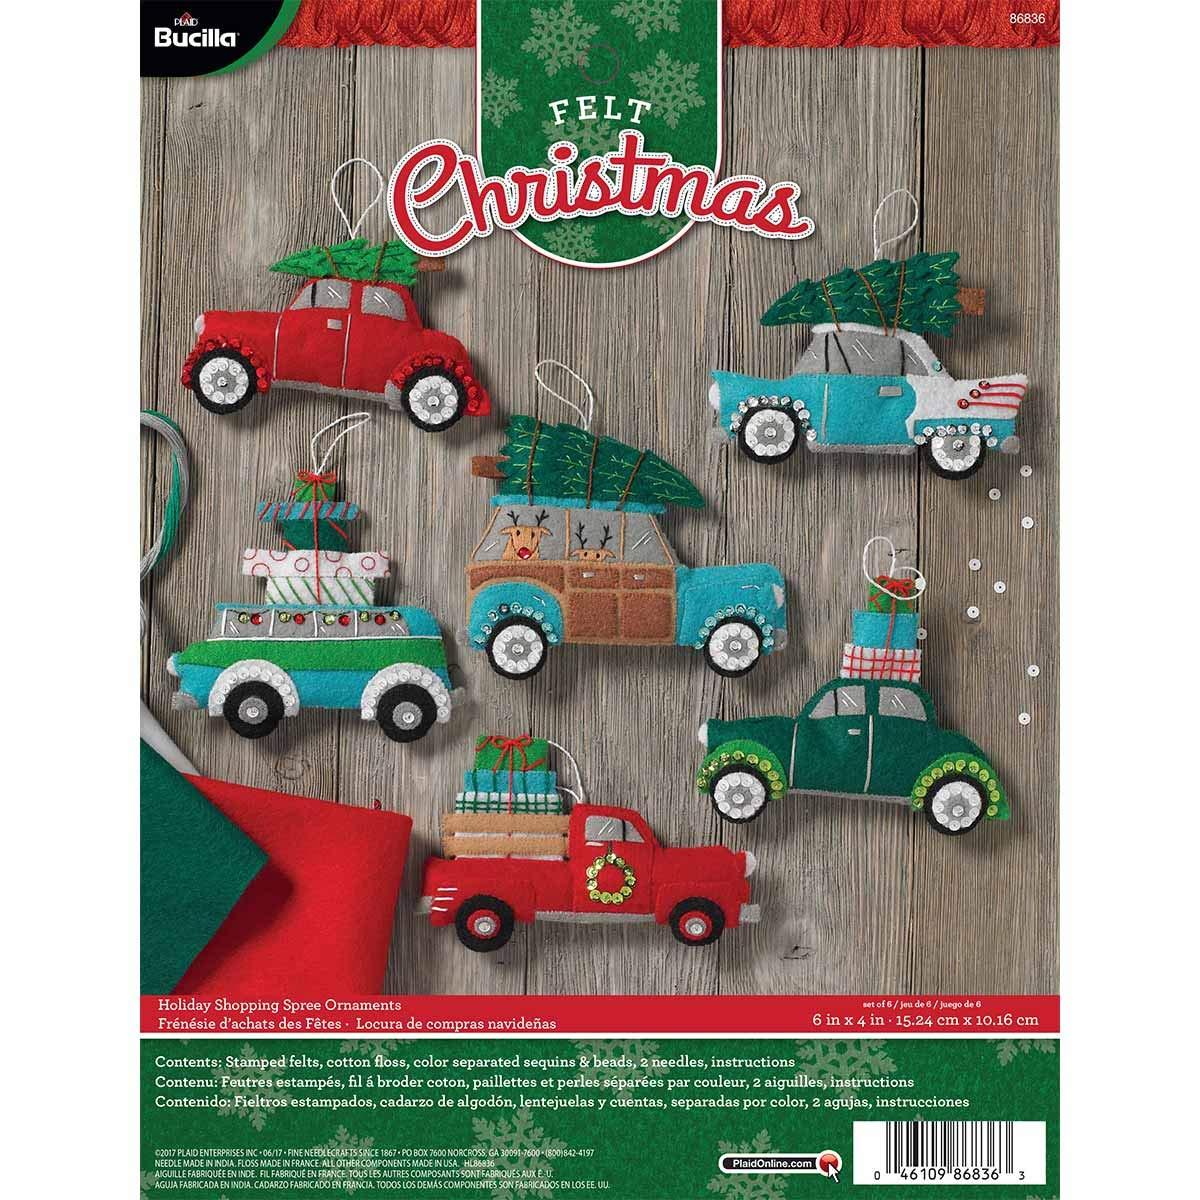 Bucilla 86836 Felt Applique Kit, Holiday Shopping Spree 6 Piece by Bucilla